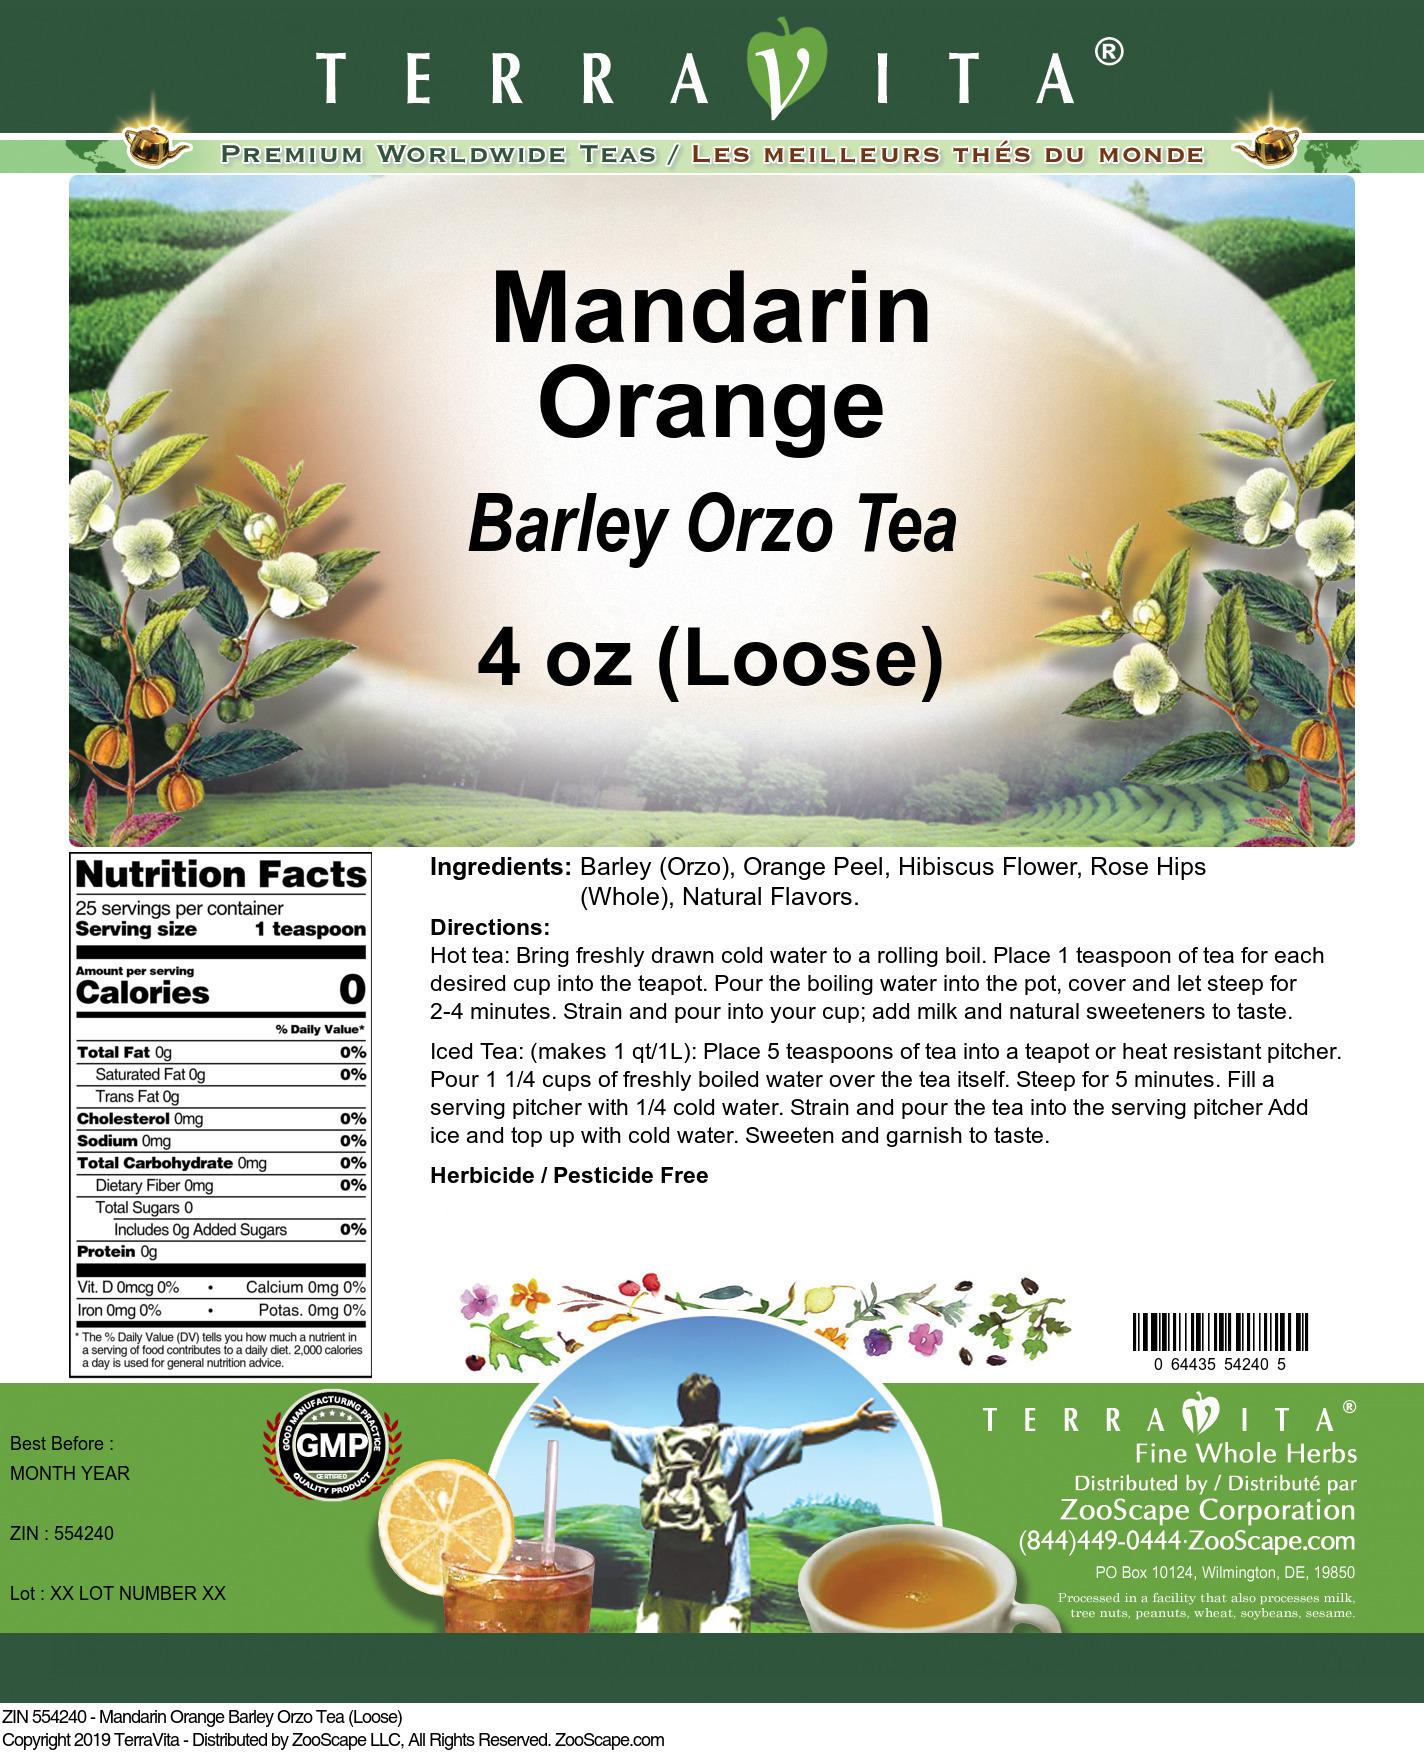 Mandarin Orange Barley Orzo